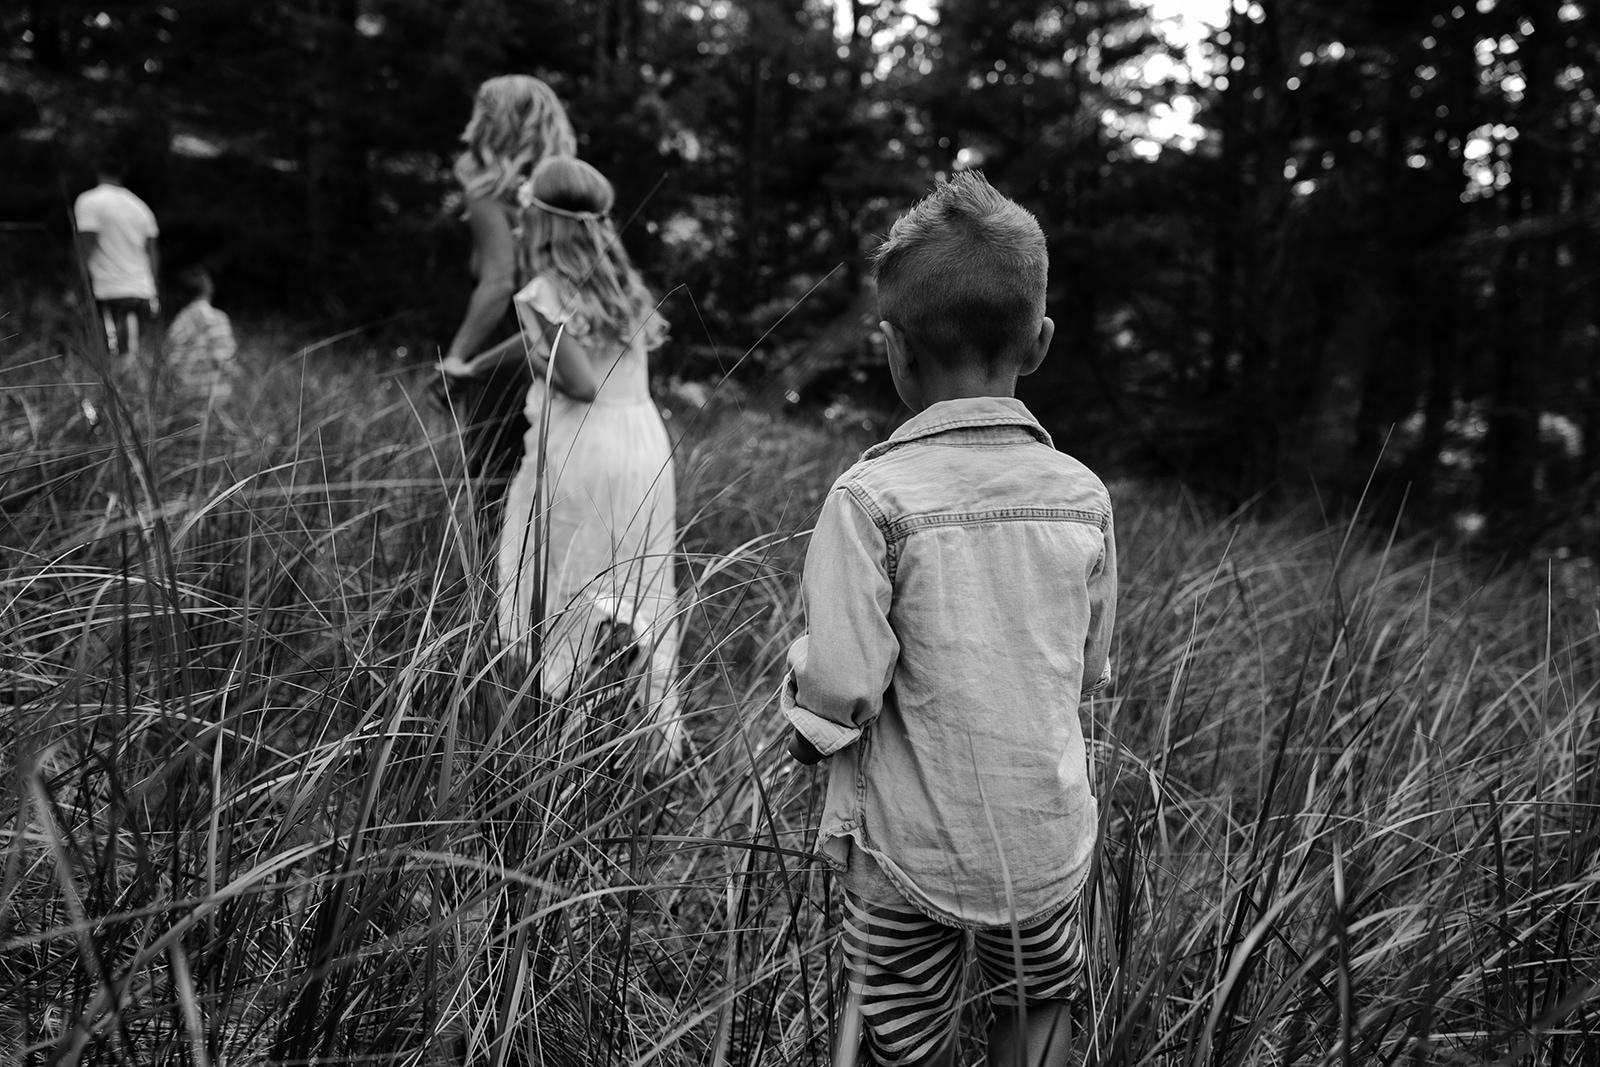 michigan-storytelling-photographer-ludington-mi-state-park-andrews-family-sunset-session-17.jpg